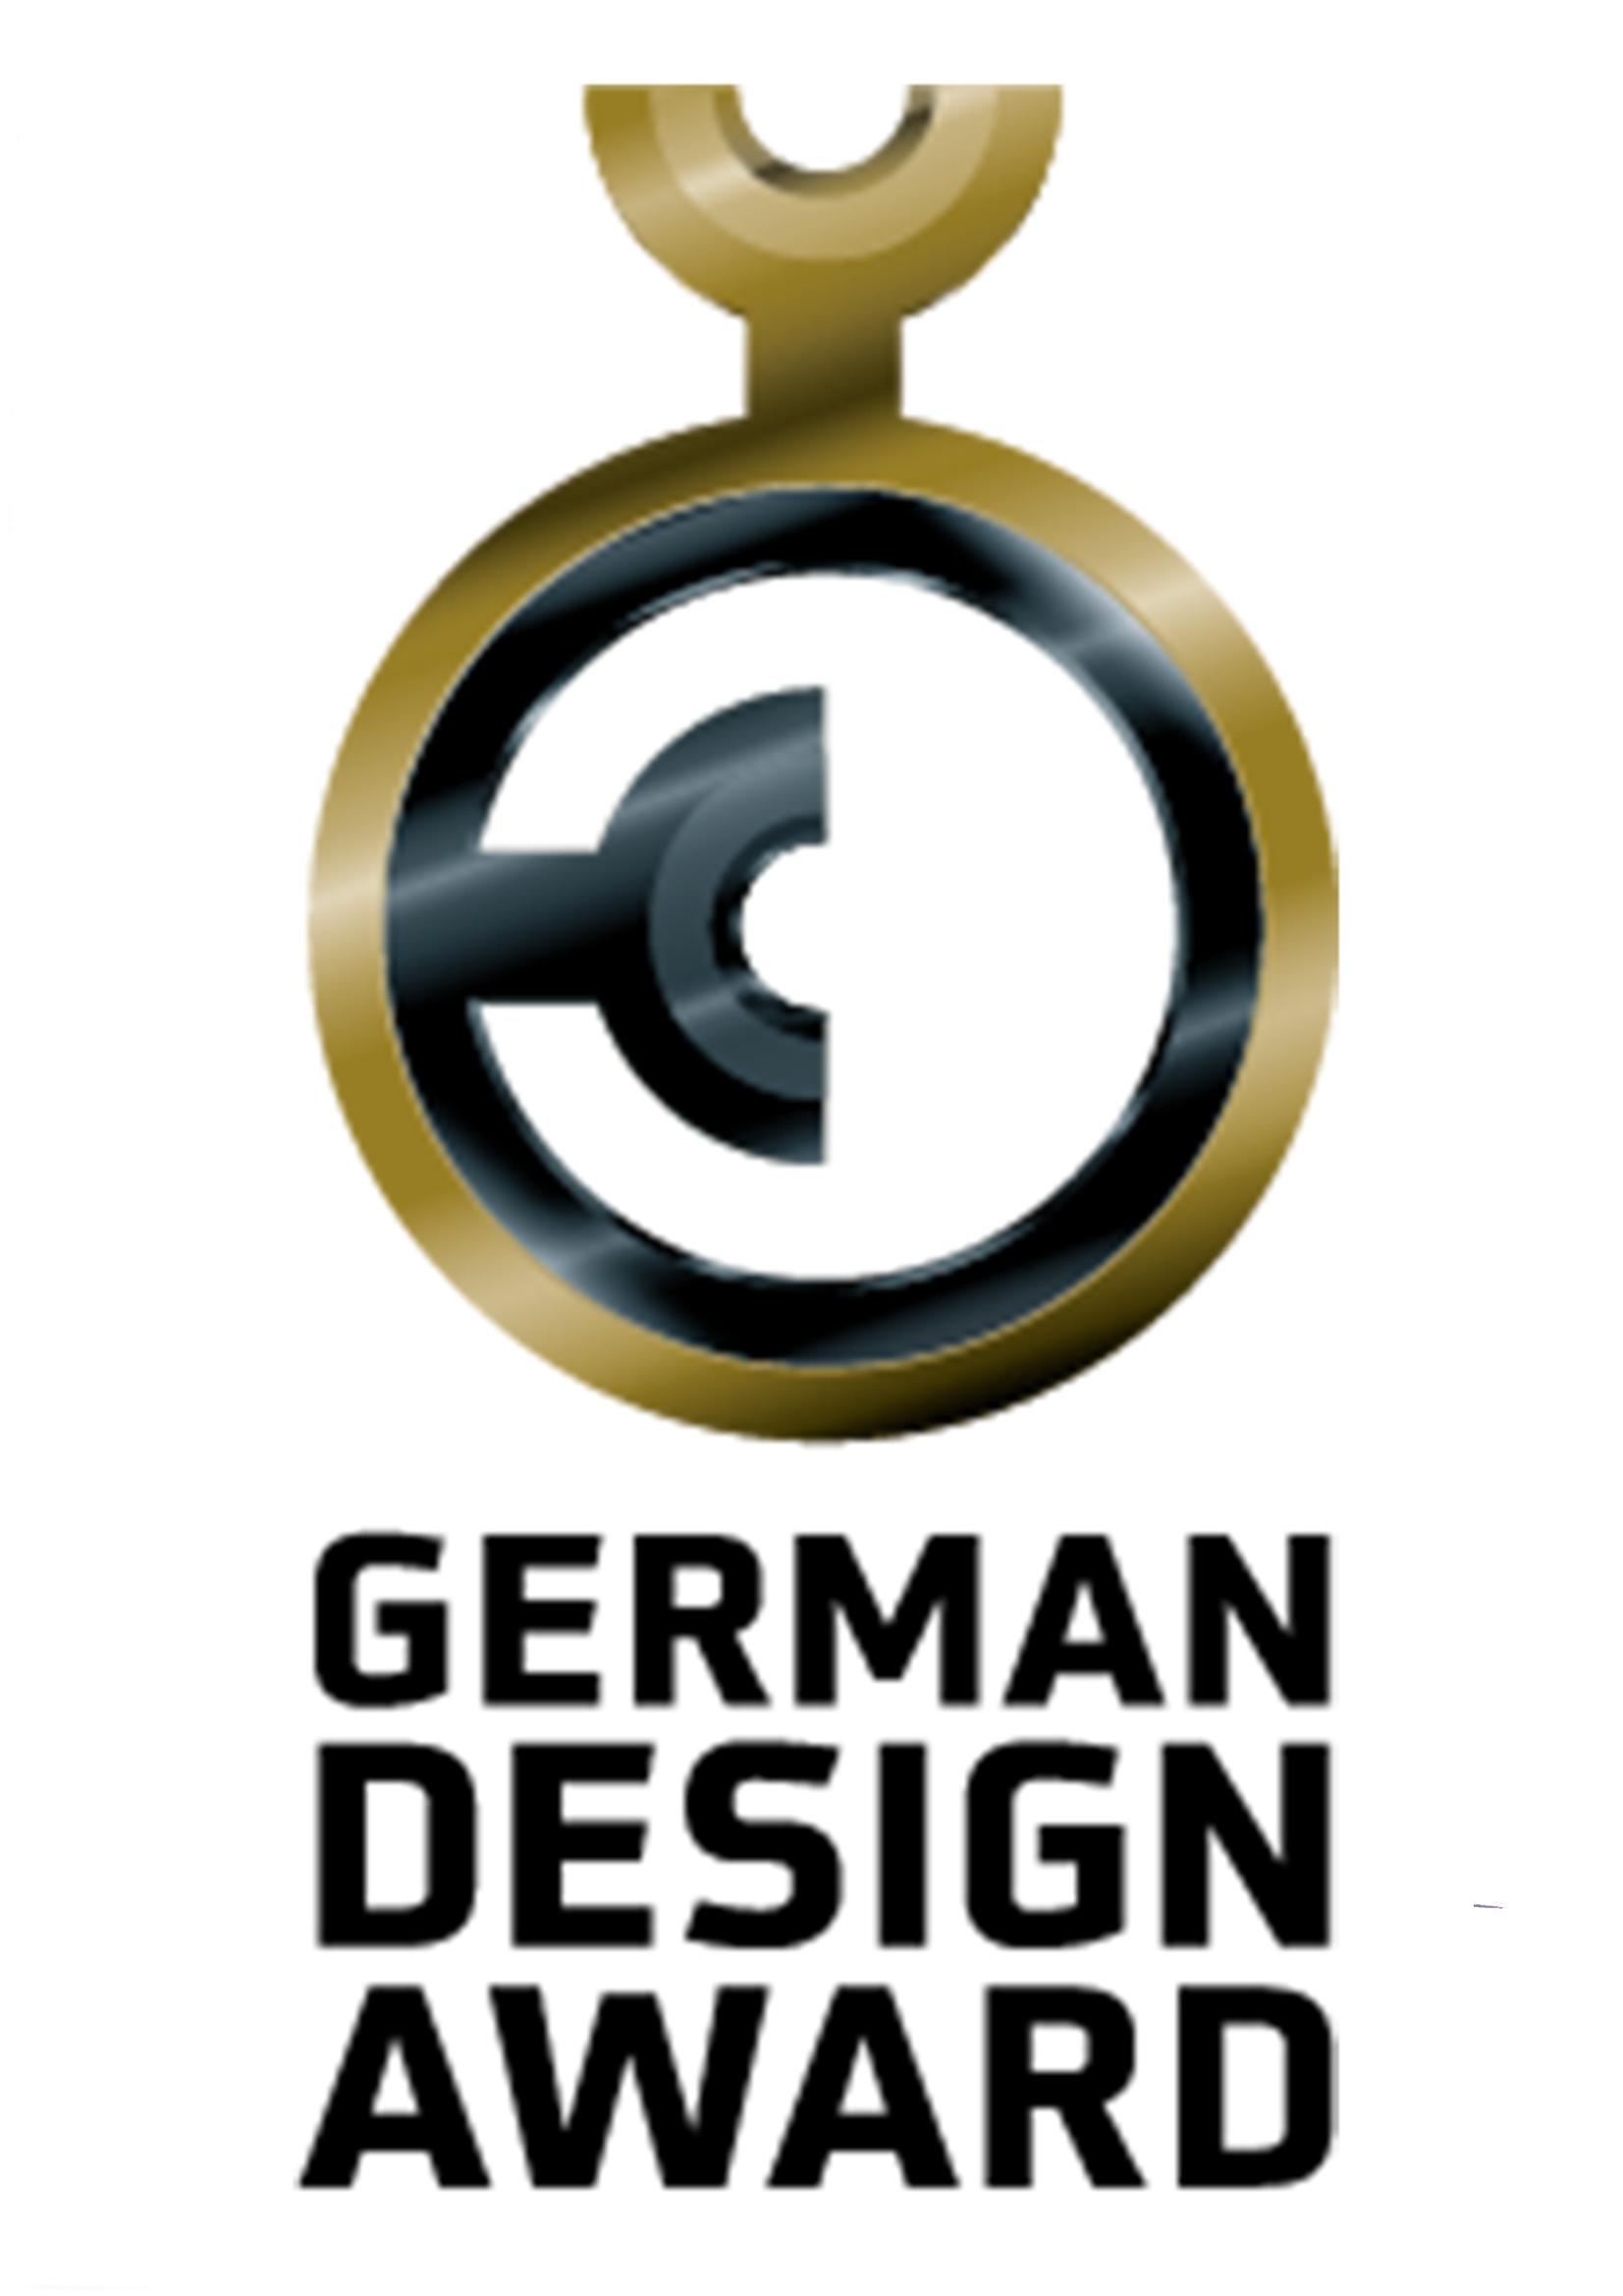 Abbildung des German Design Award Logo